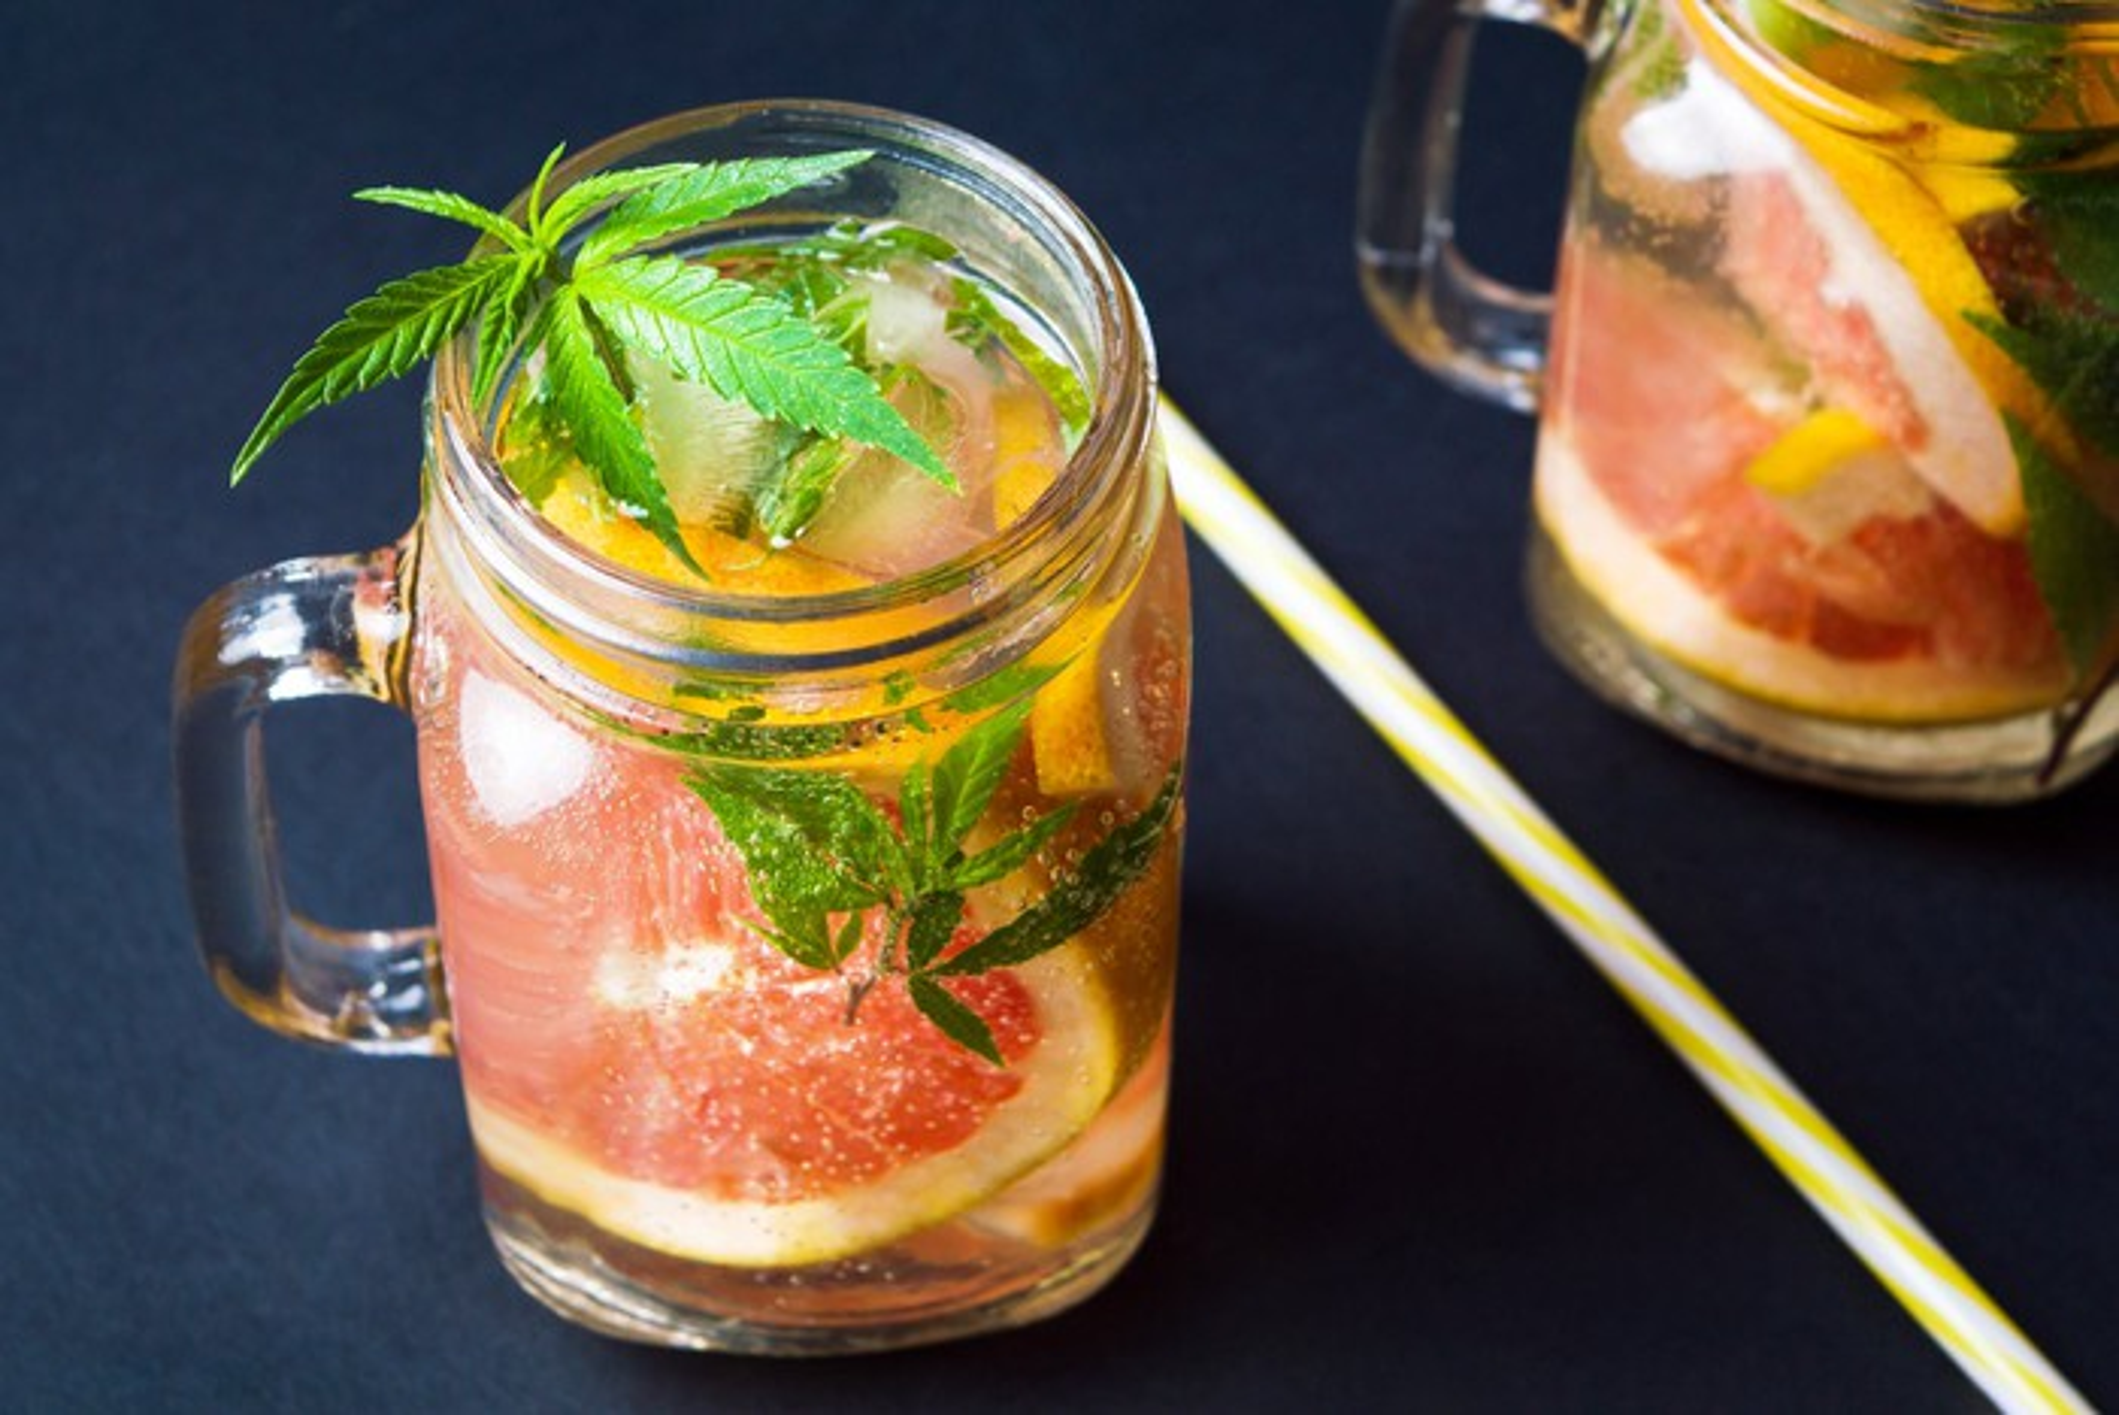 A grapefruit beverage with a marijuana leaf in it.